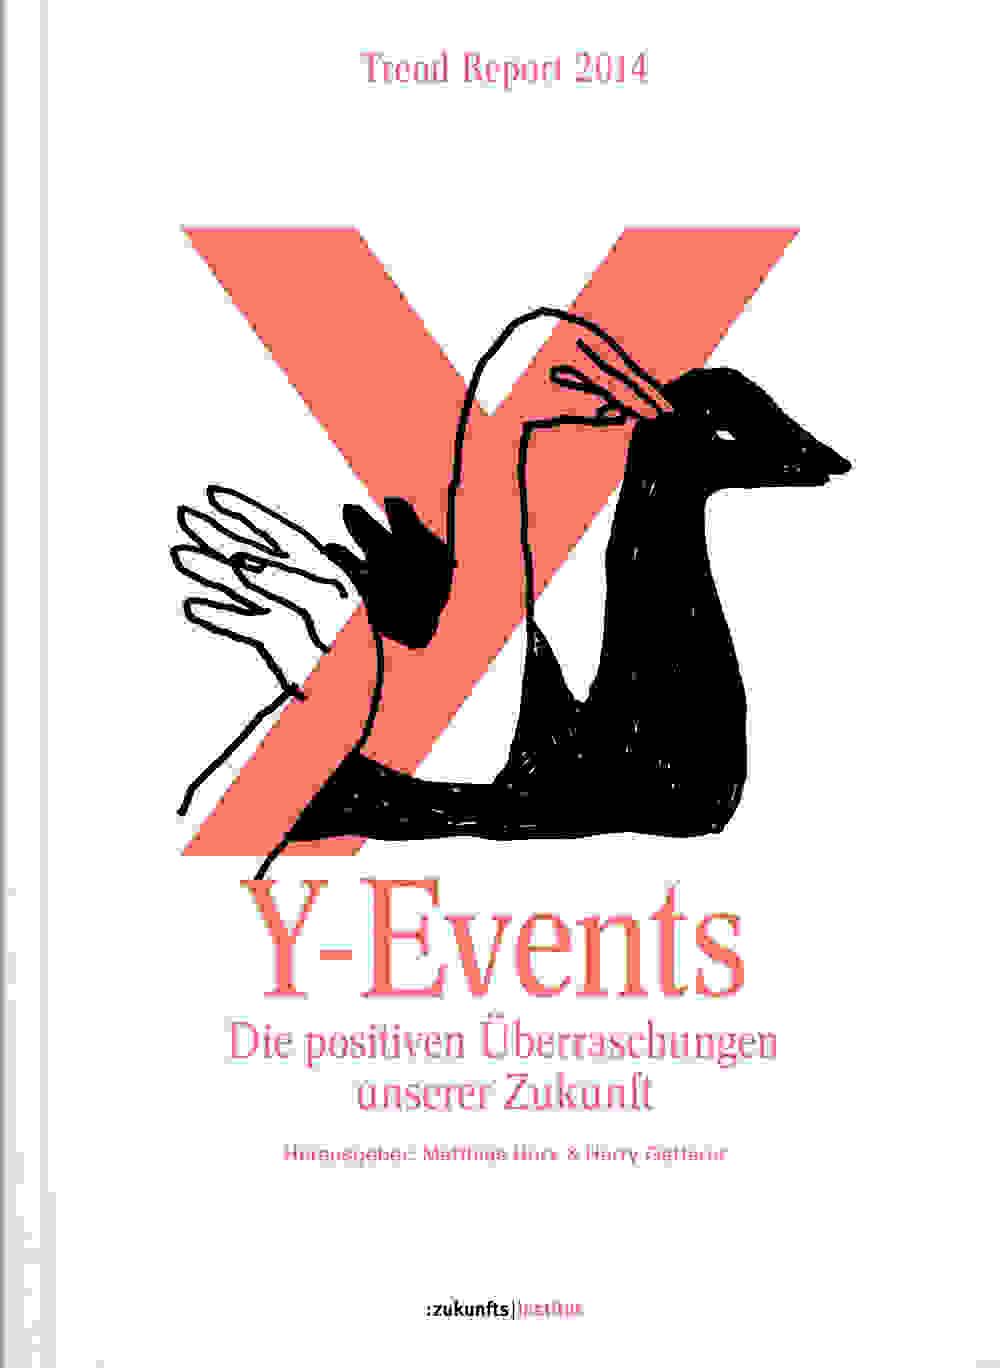 Zukunftsinstitut Trendreport 2014 Cover 00